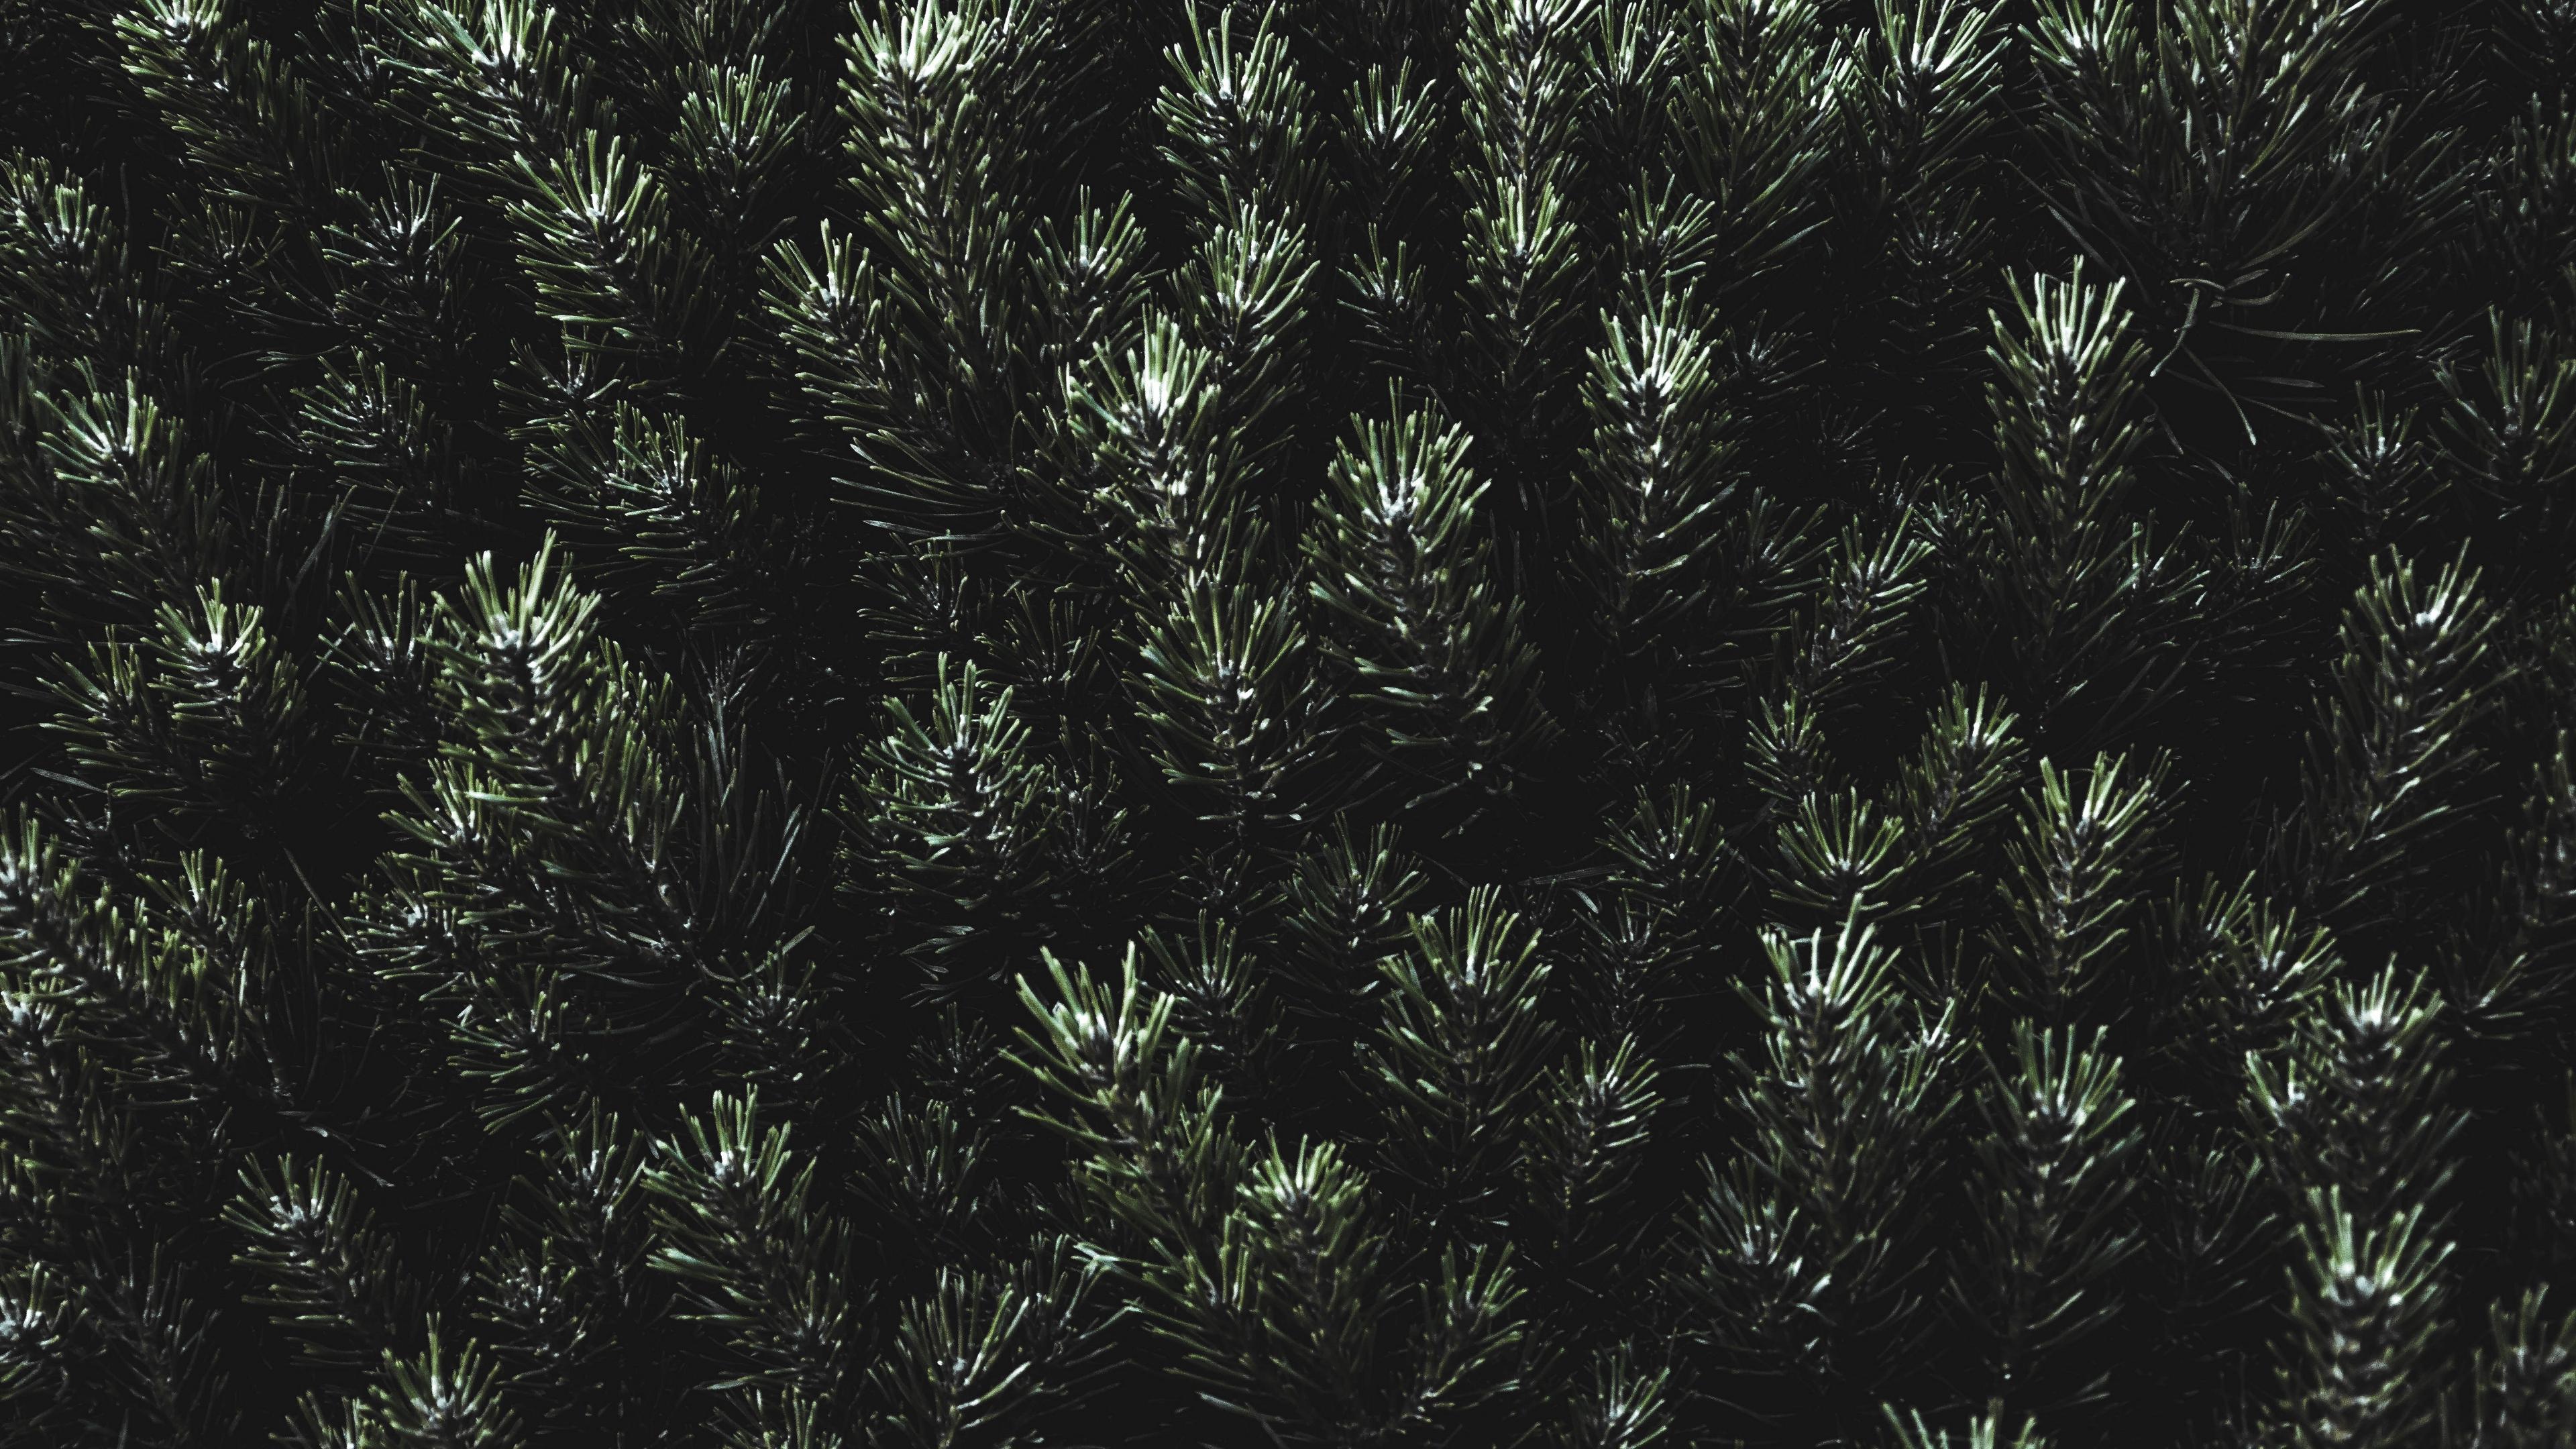 pine needles branches green 4k 1540575116 - pine, needles, branches, green 4k - Pine, needles, branches